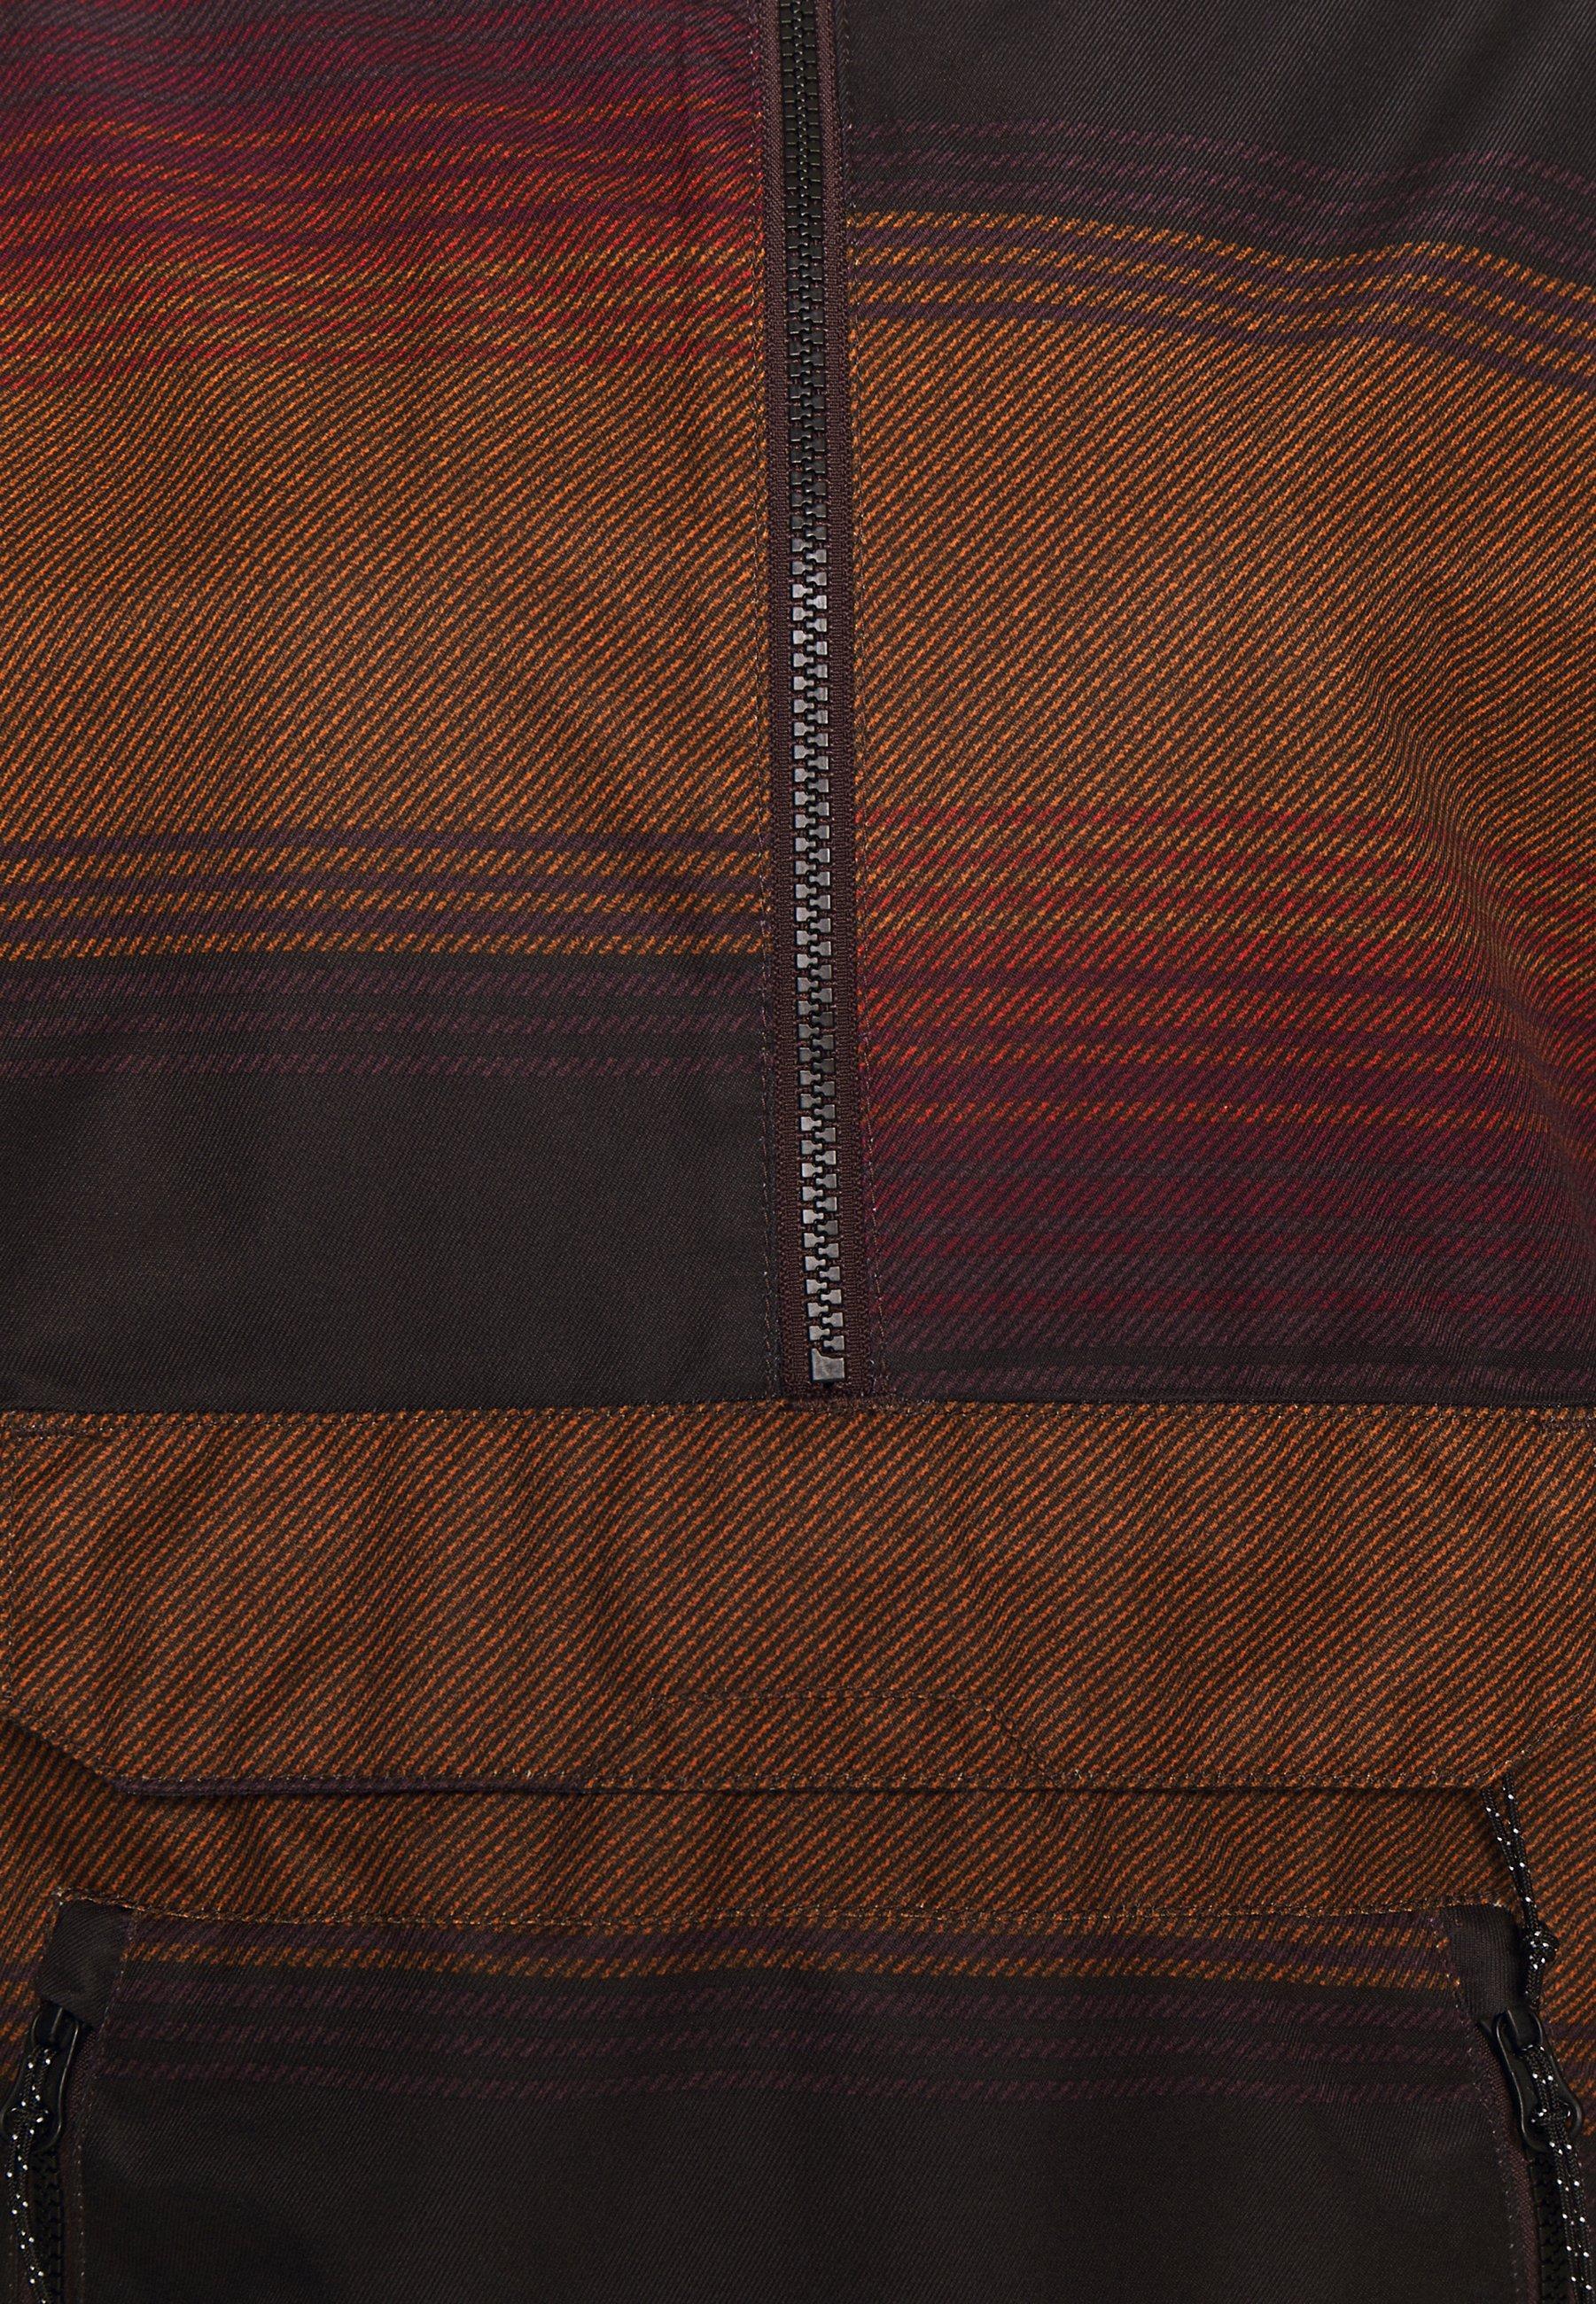 Volcom MIRROR PULLOVER - Snowboard jacket - dark red 5Xvf5